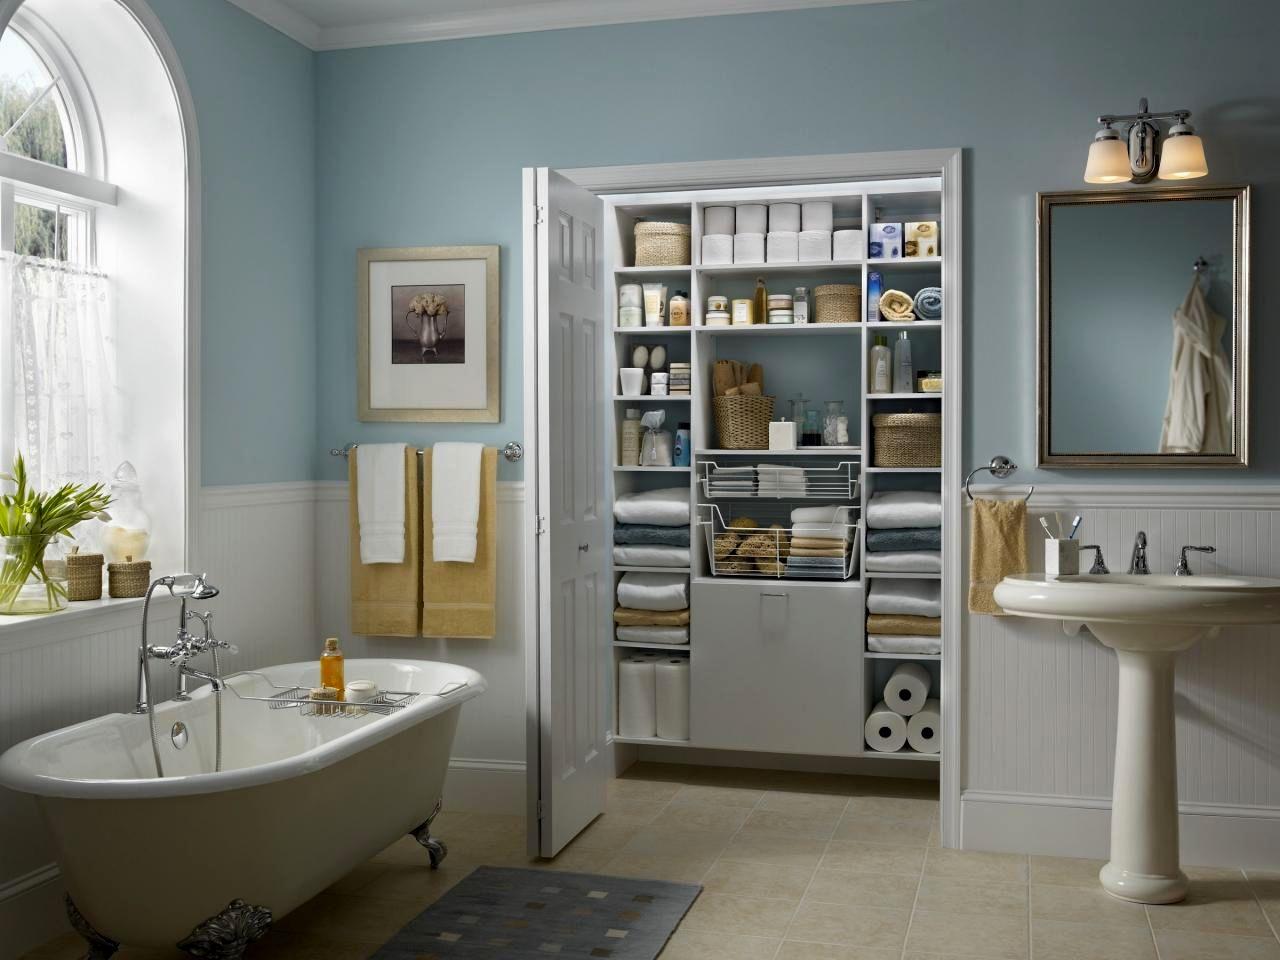 fancy bathroom organization ideas wallpaper-Amazing Bathroom organization Ideas Inspiration